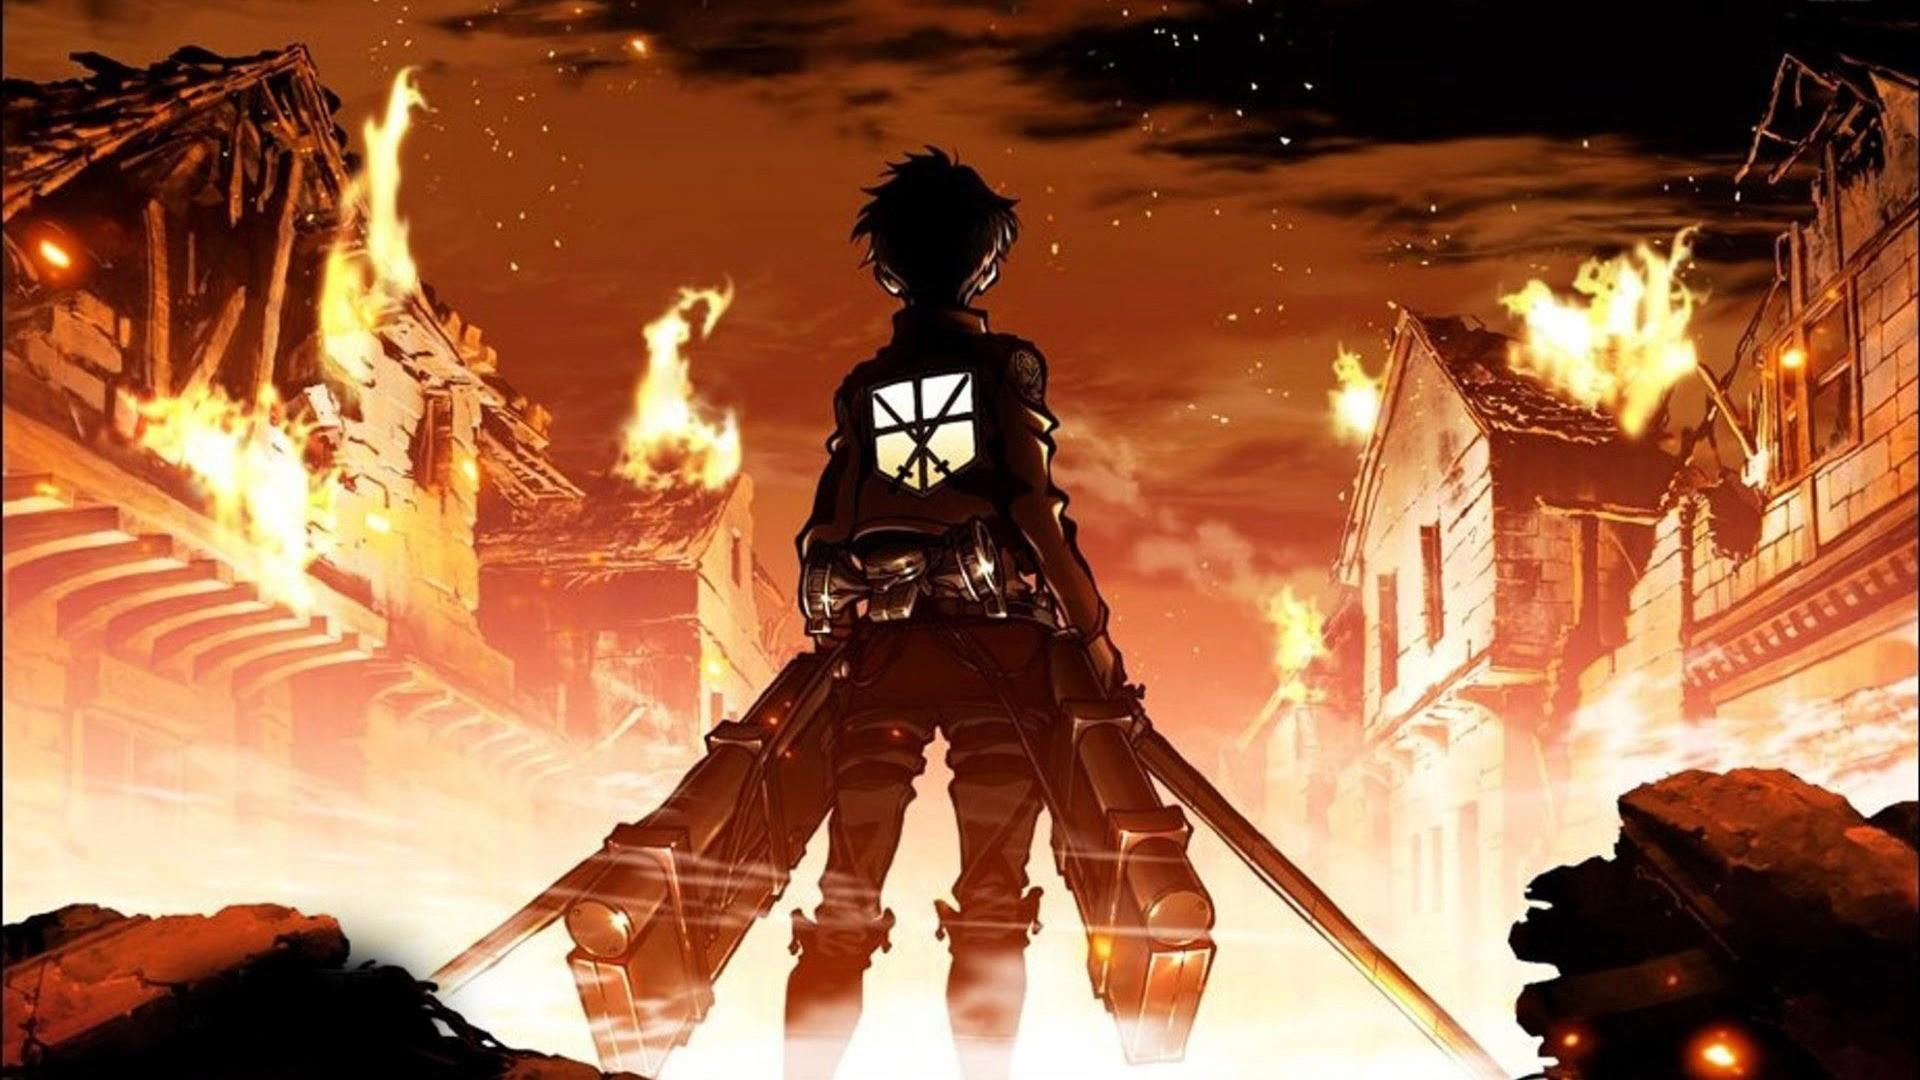 Anime 1920x1080 Shingeki no Kyojin Eren Jeager anime